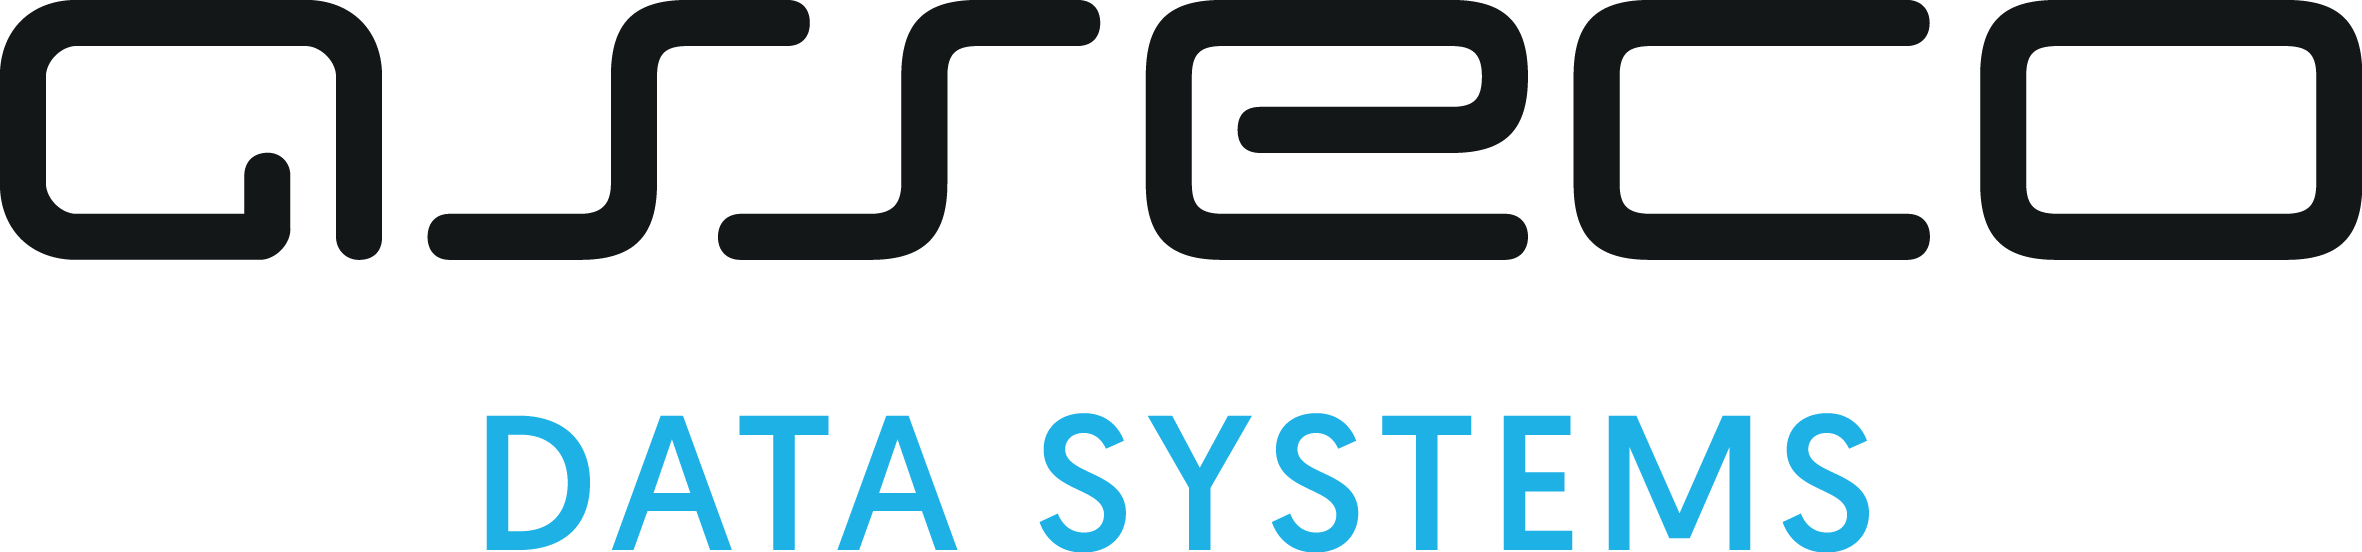 asse_datasys